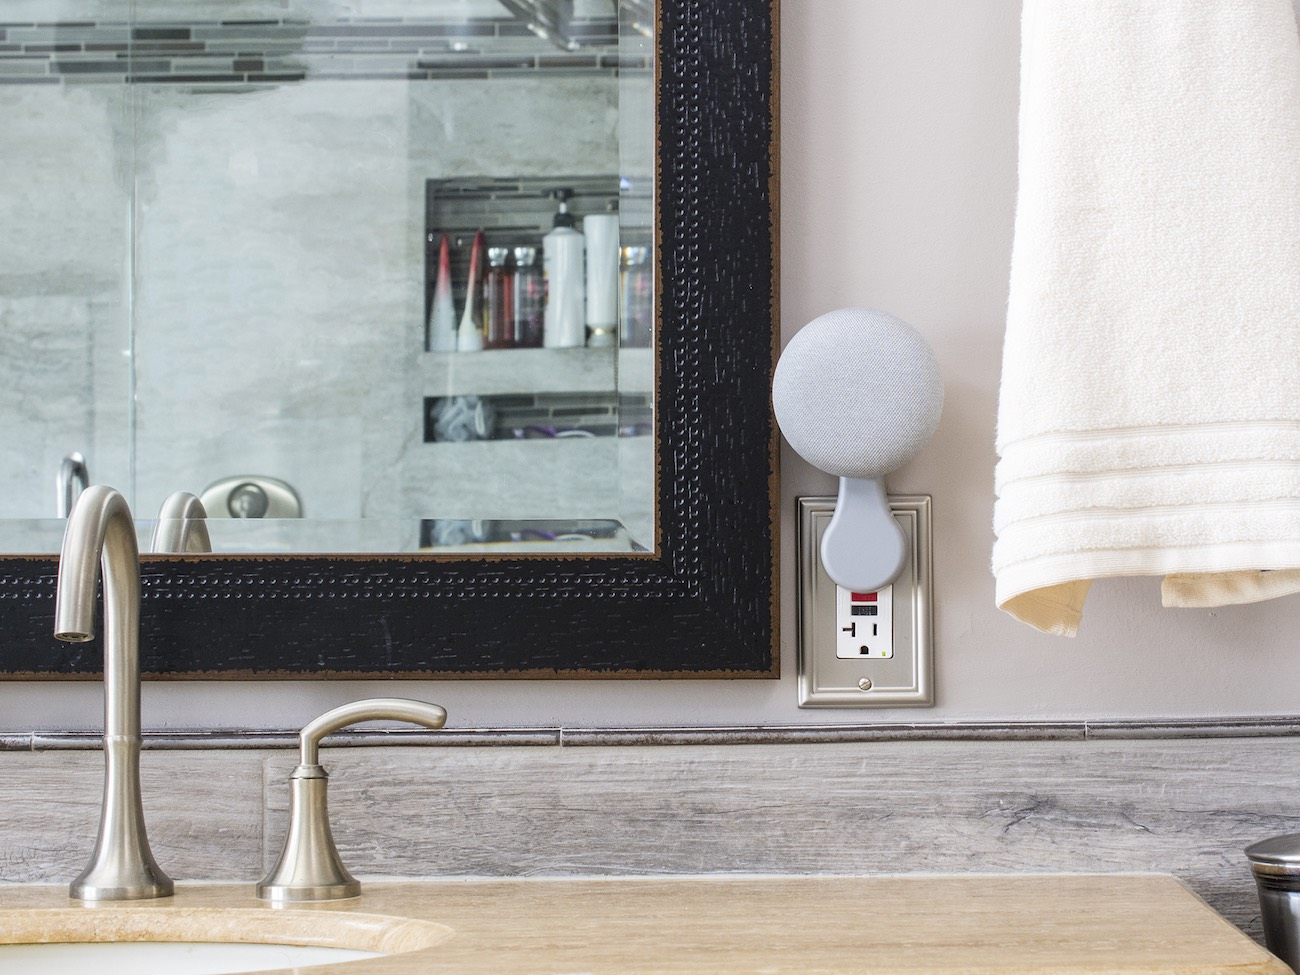 This Mini Google Home Mini Outlet Mount